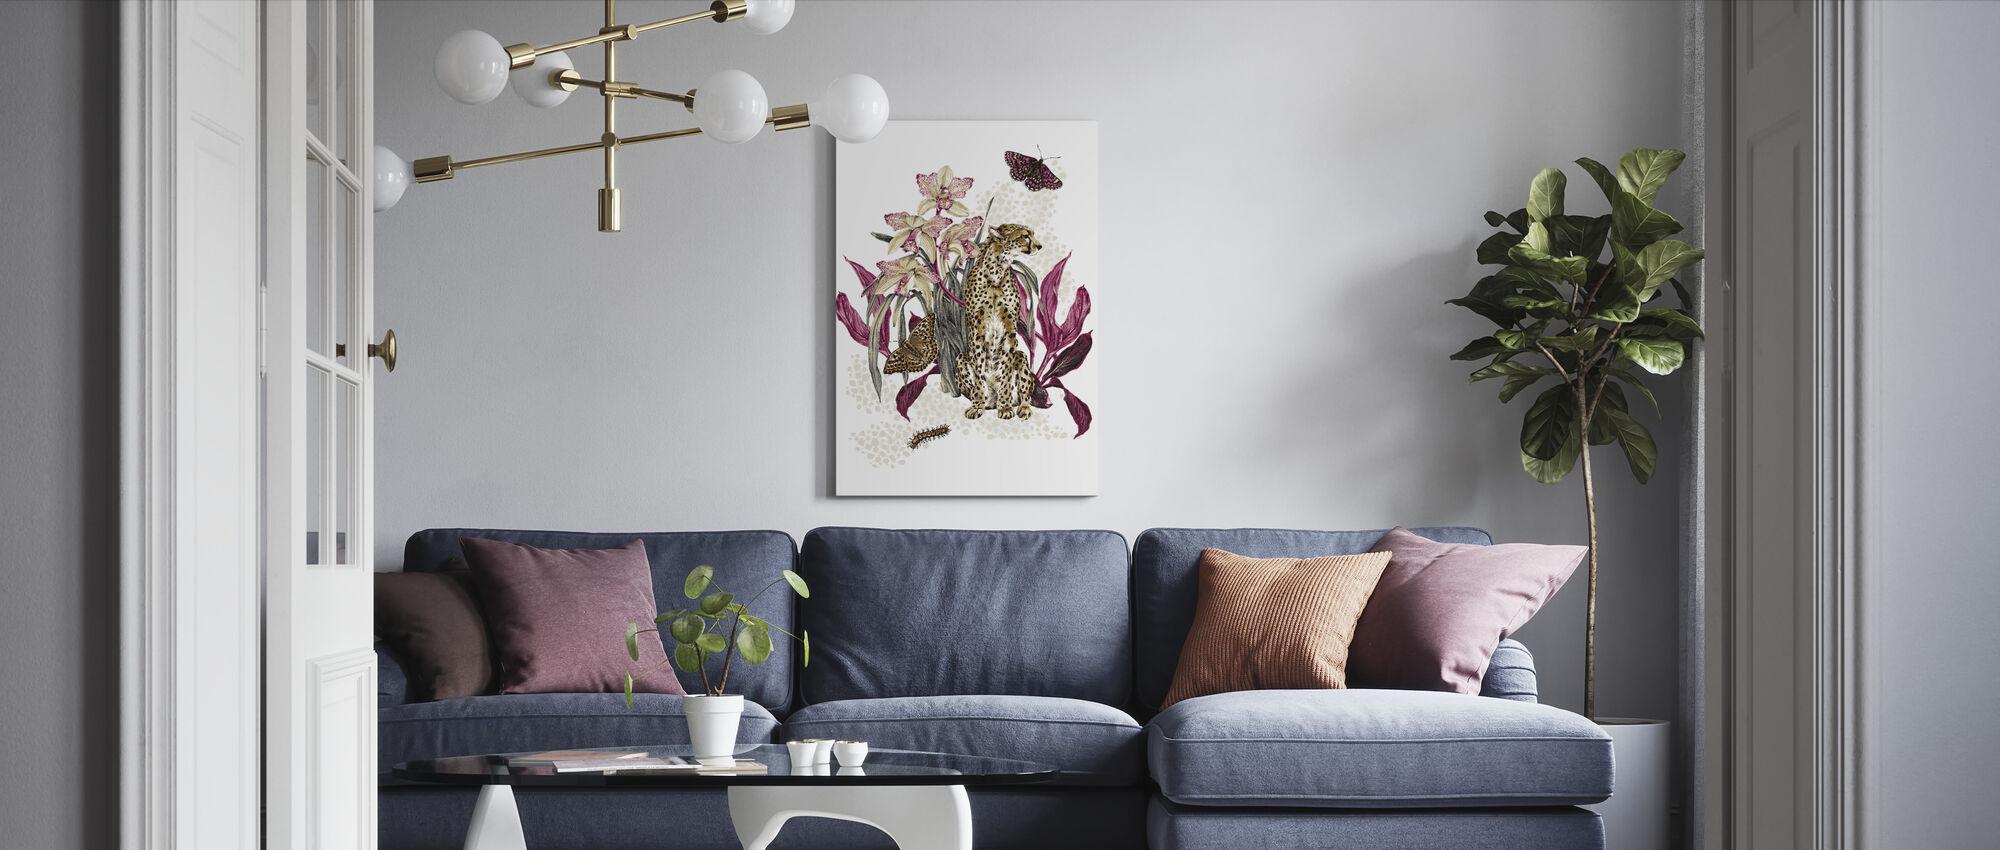 Cheetah Reveries - Cognac and Fuschia - Canvas print - Living Room